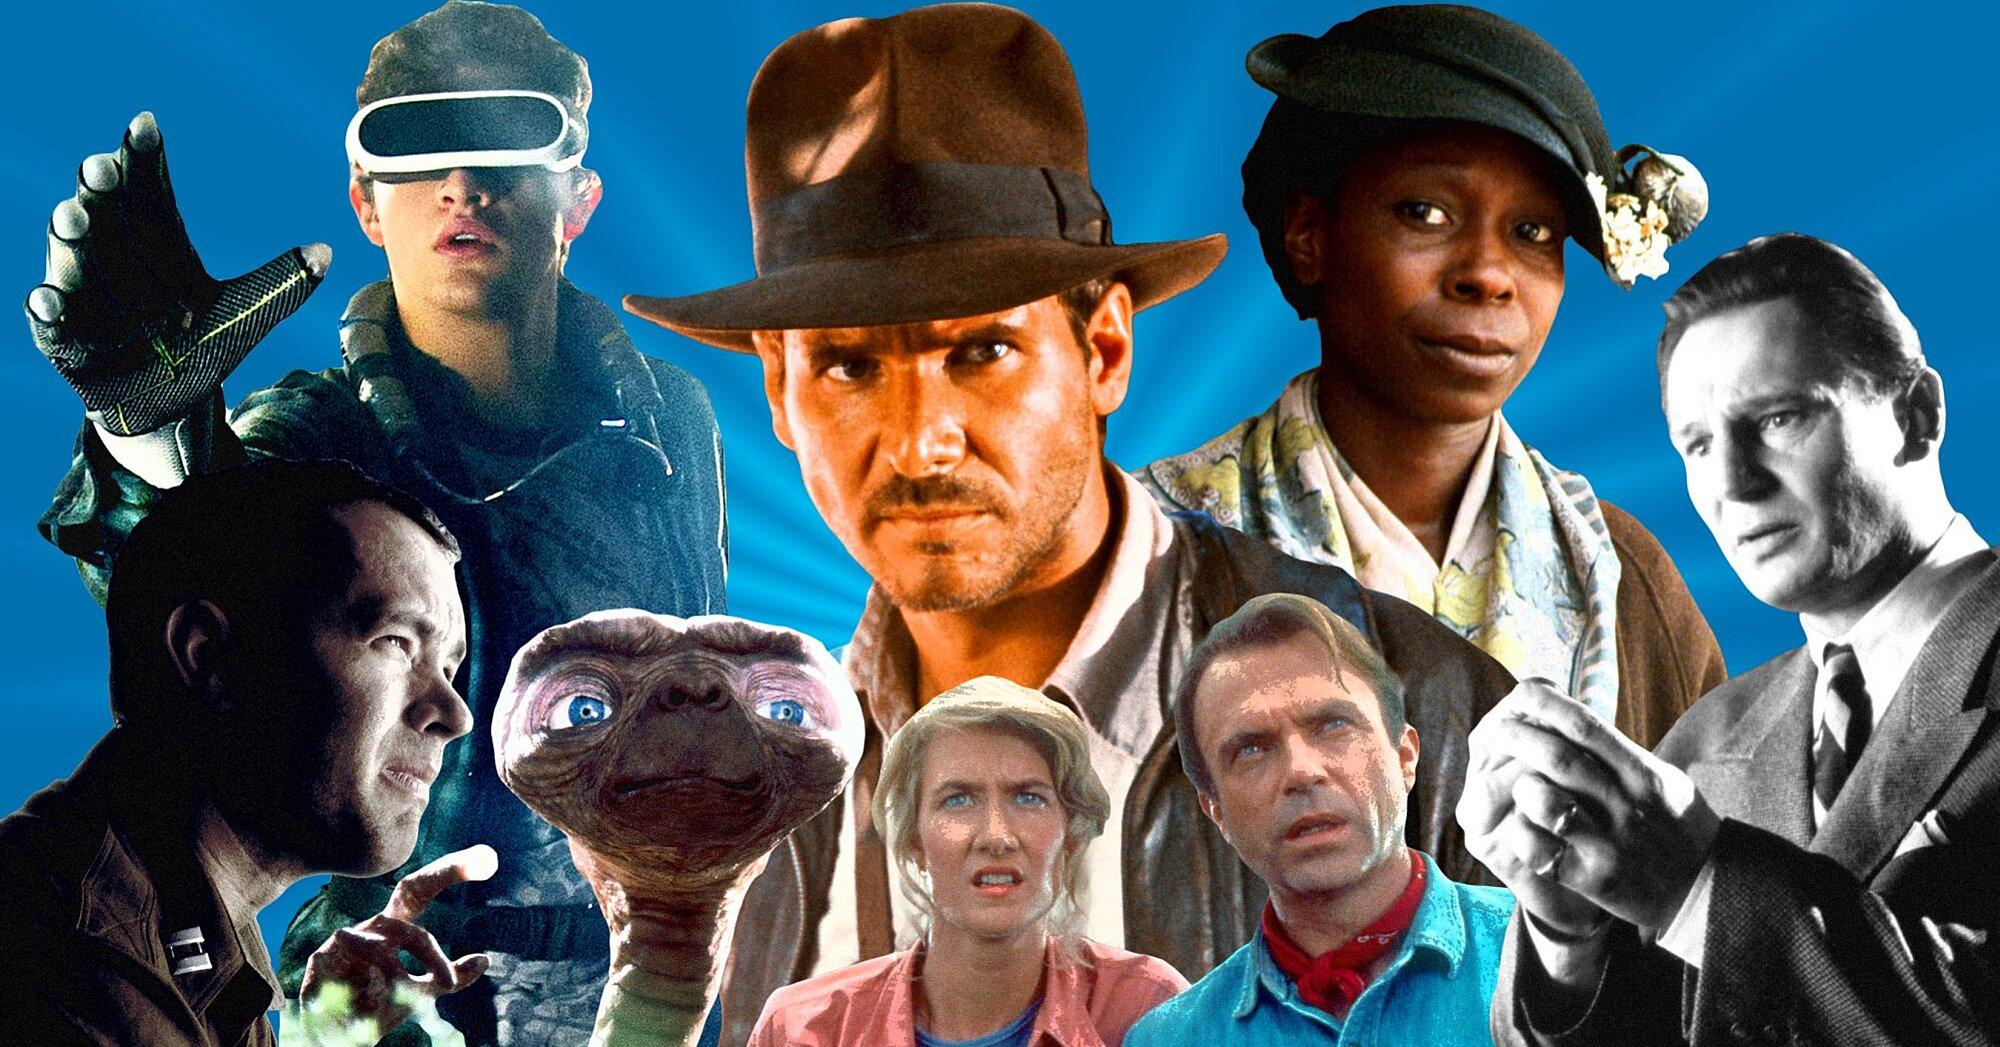 Every Steven Spielberg movie, ranked